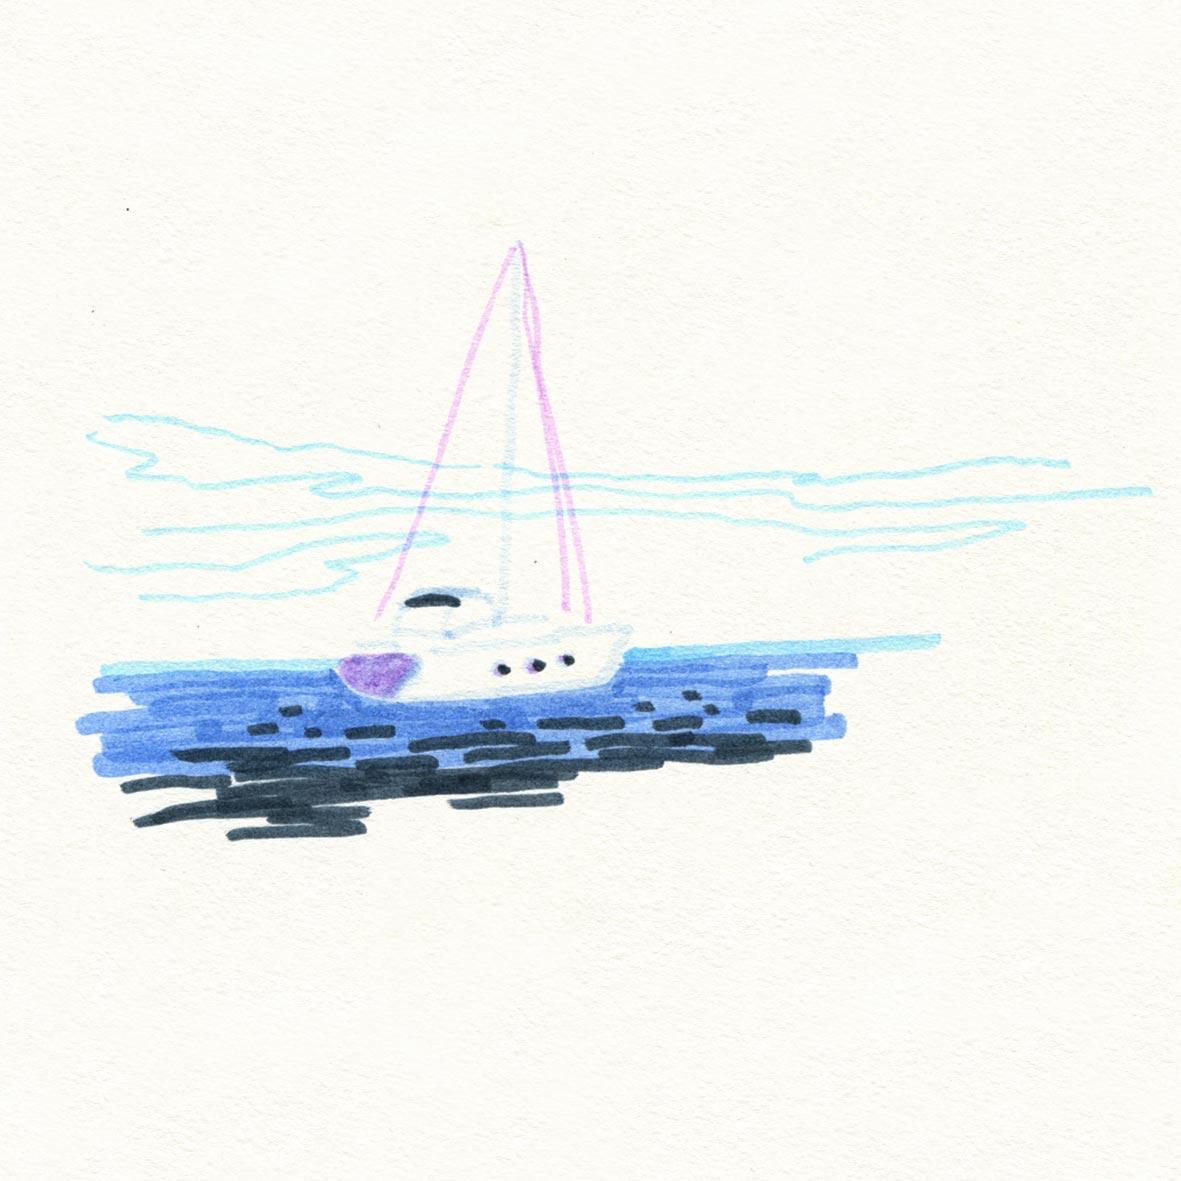 croquis_summer_sketche_feutre_water_02